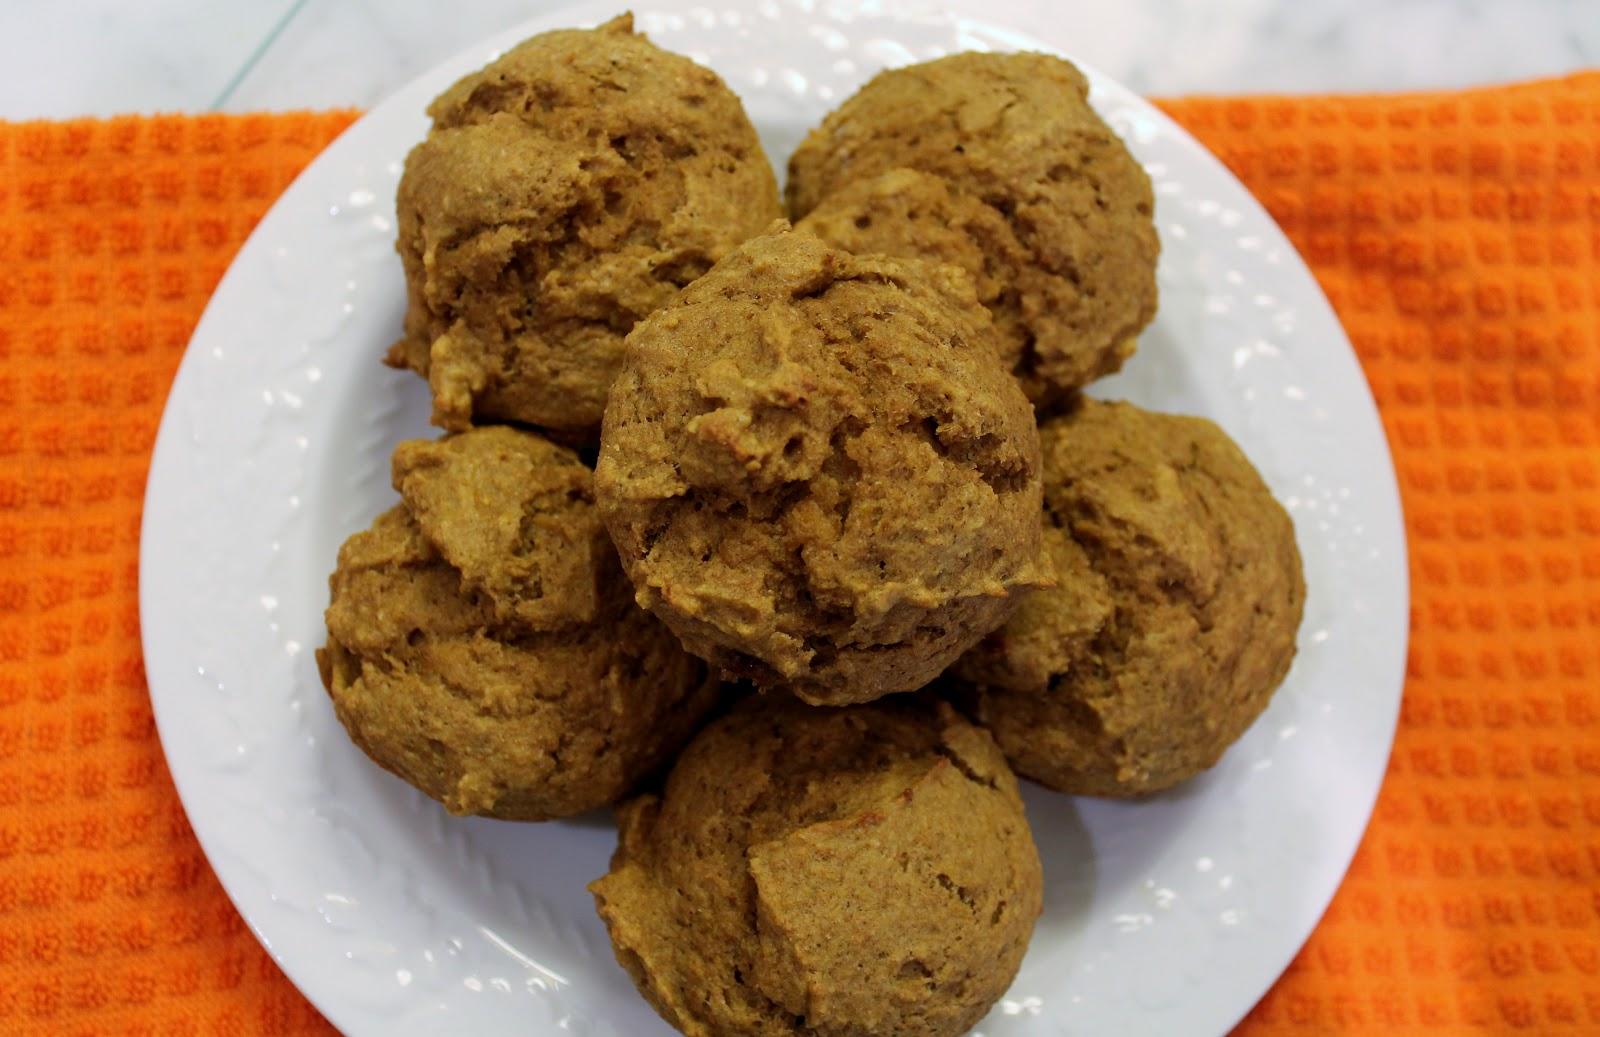 Key Ingredients: Whole Wheat Pumpkin Applesauce Muffins